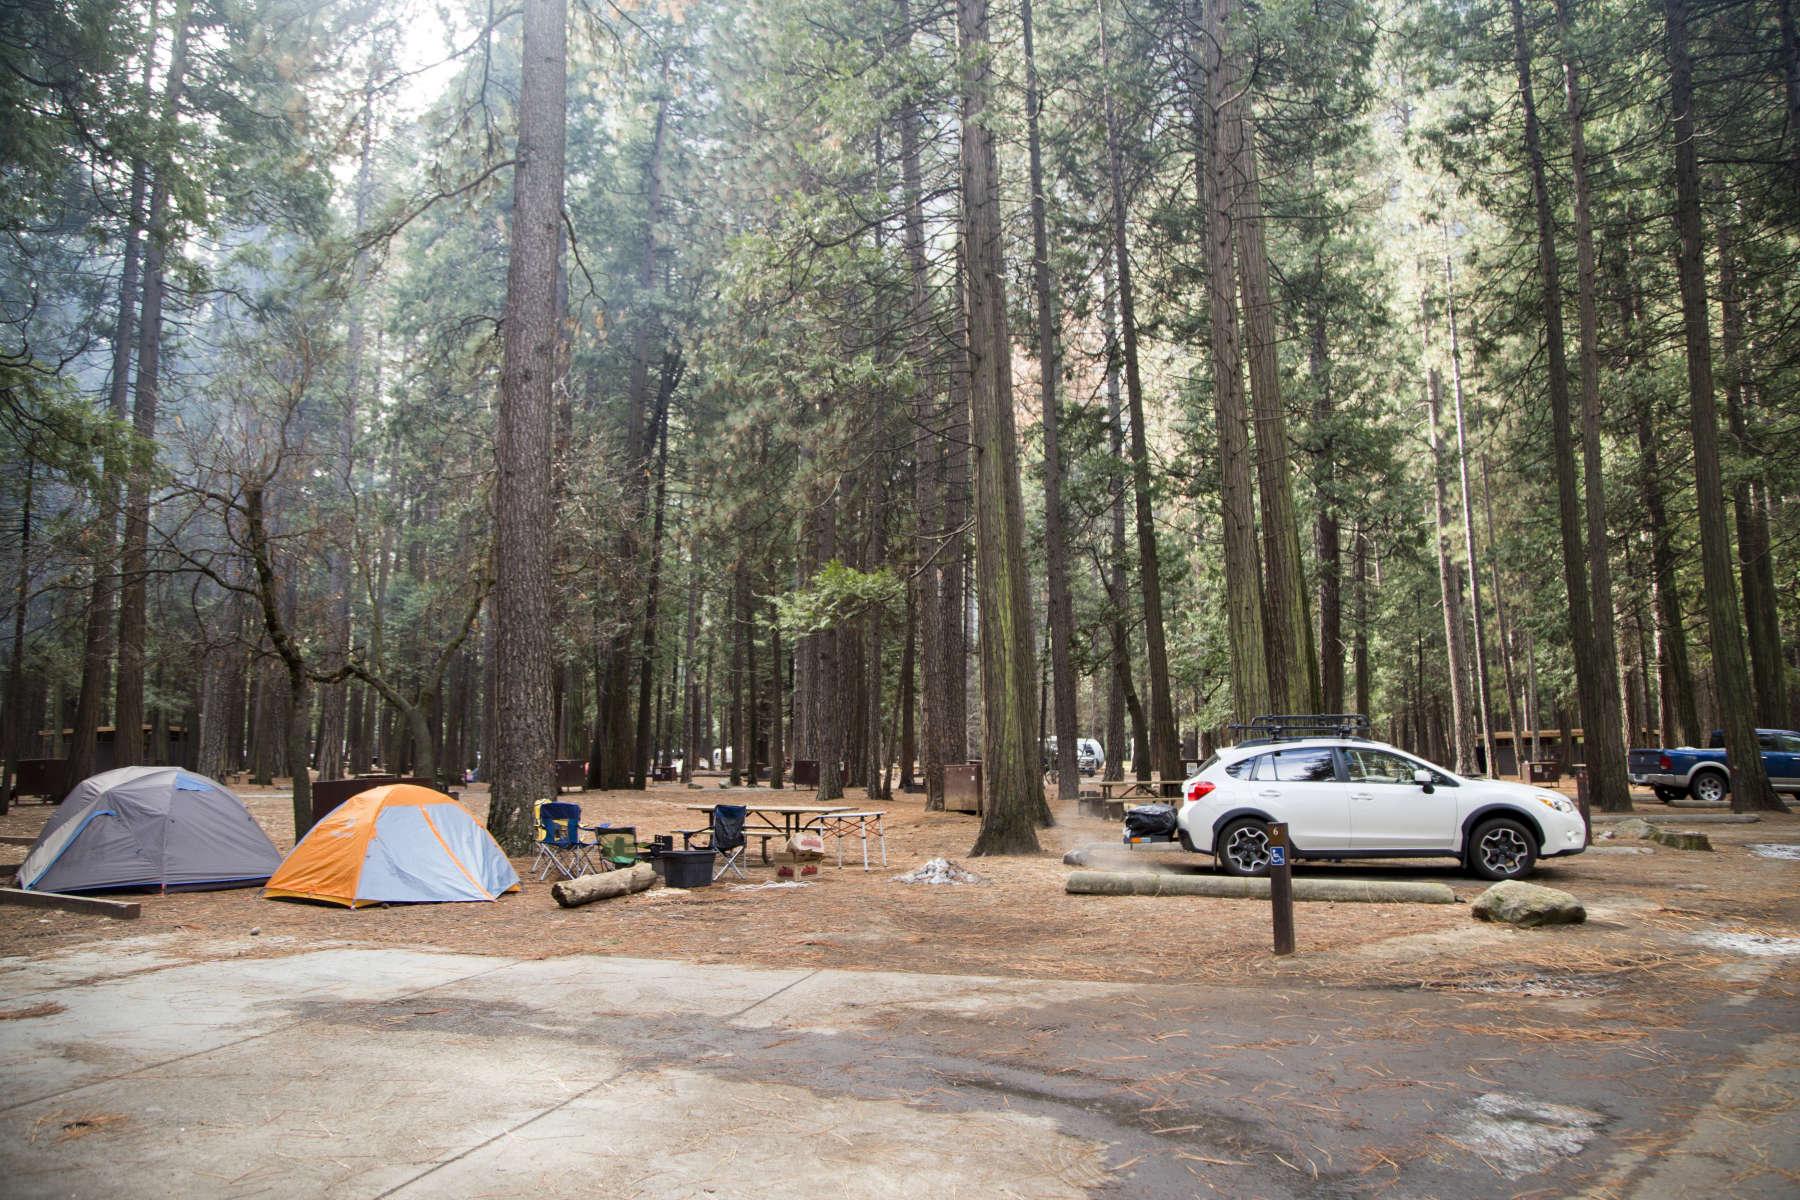 Upper Pines Campground, Yosemite, CA: 54 Hipcamper Reviews